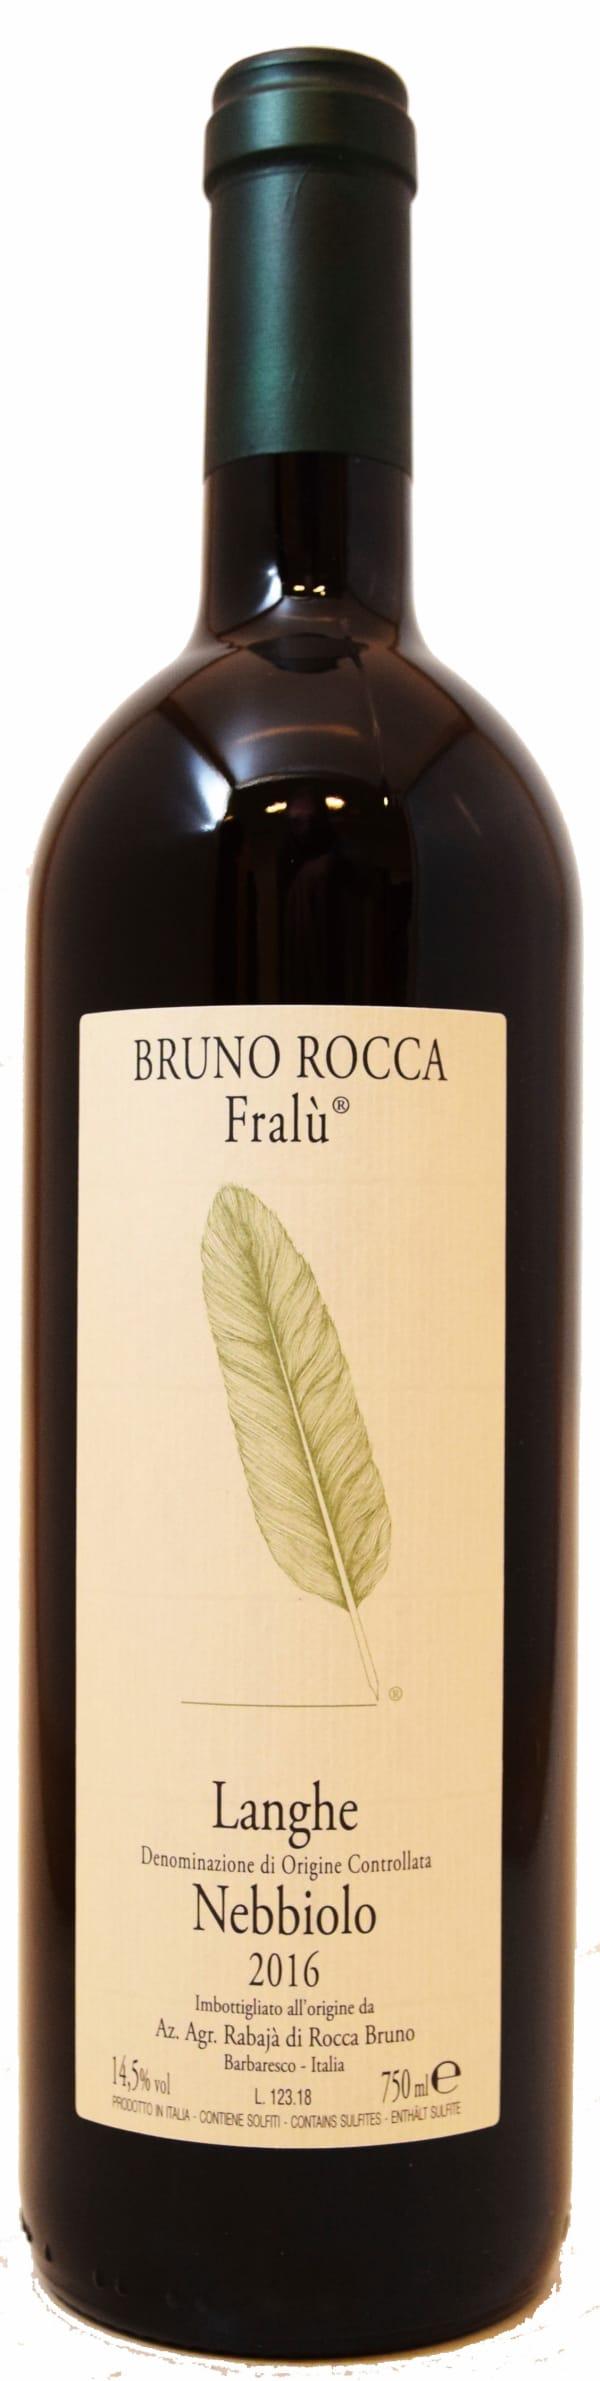 Bruno Rocca Fralu Nebbiolo 2016